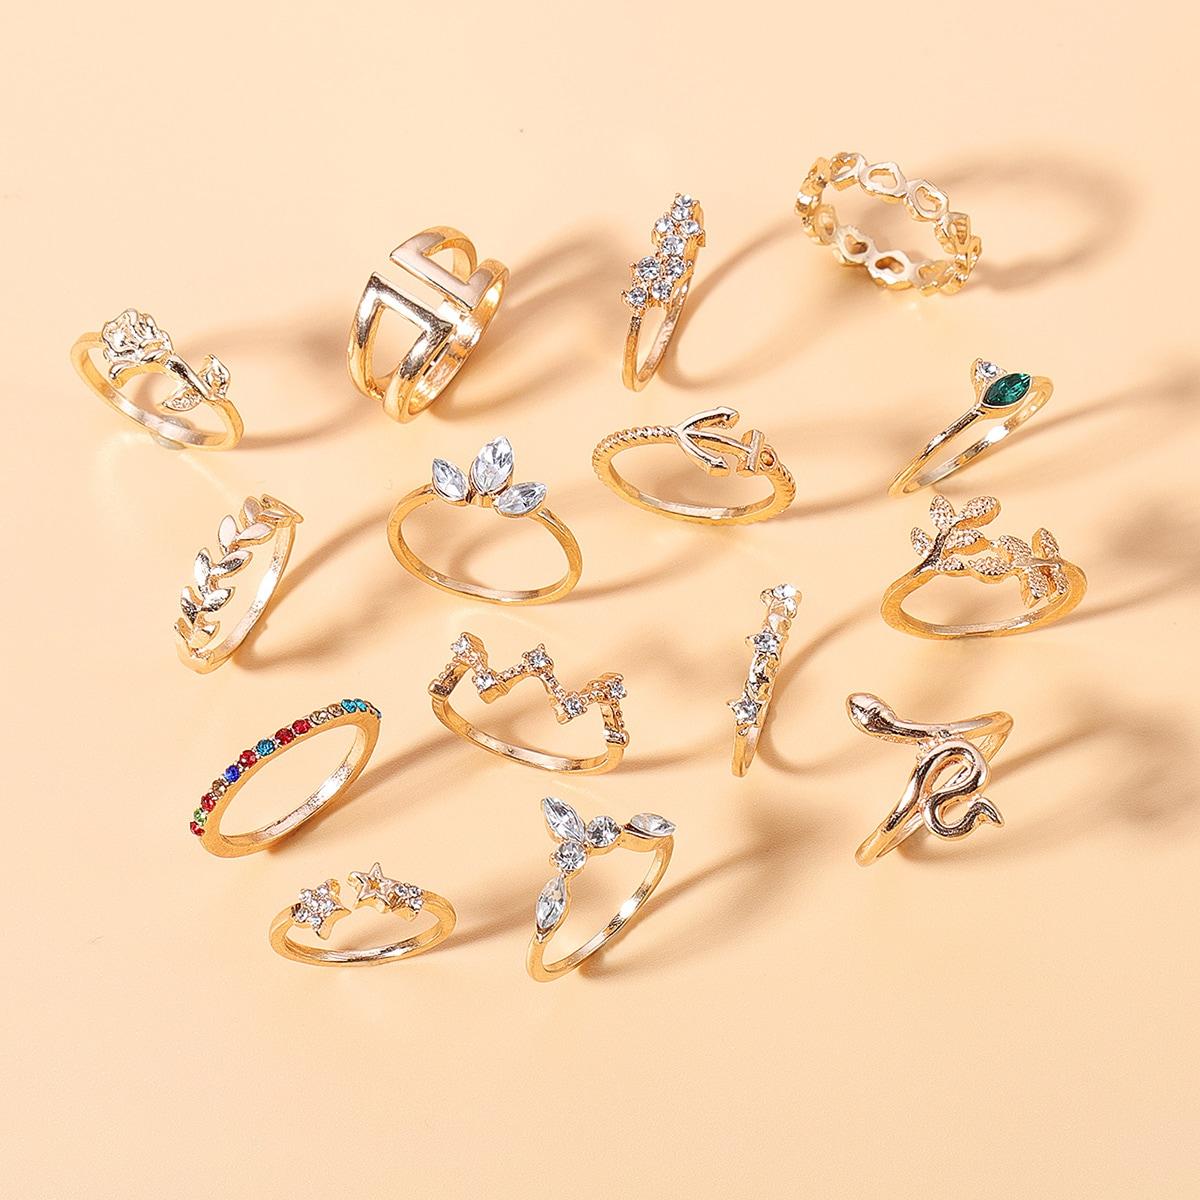 15 piezas anillo grabado con diamante de imitación